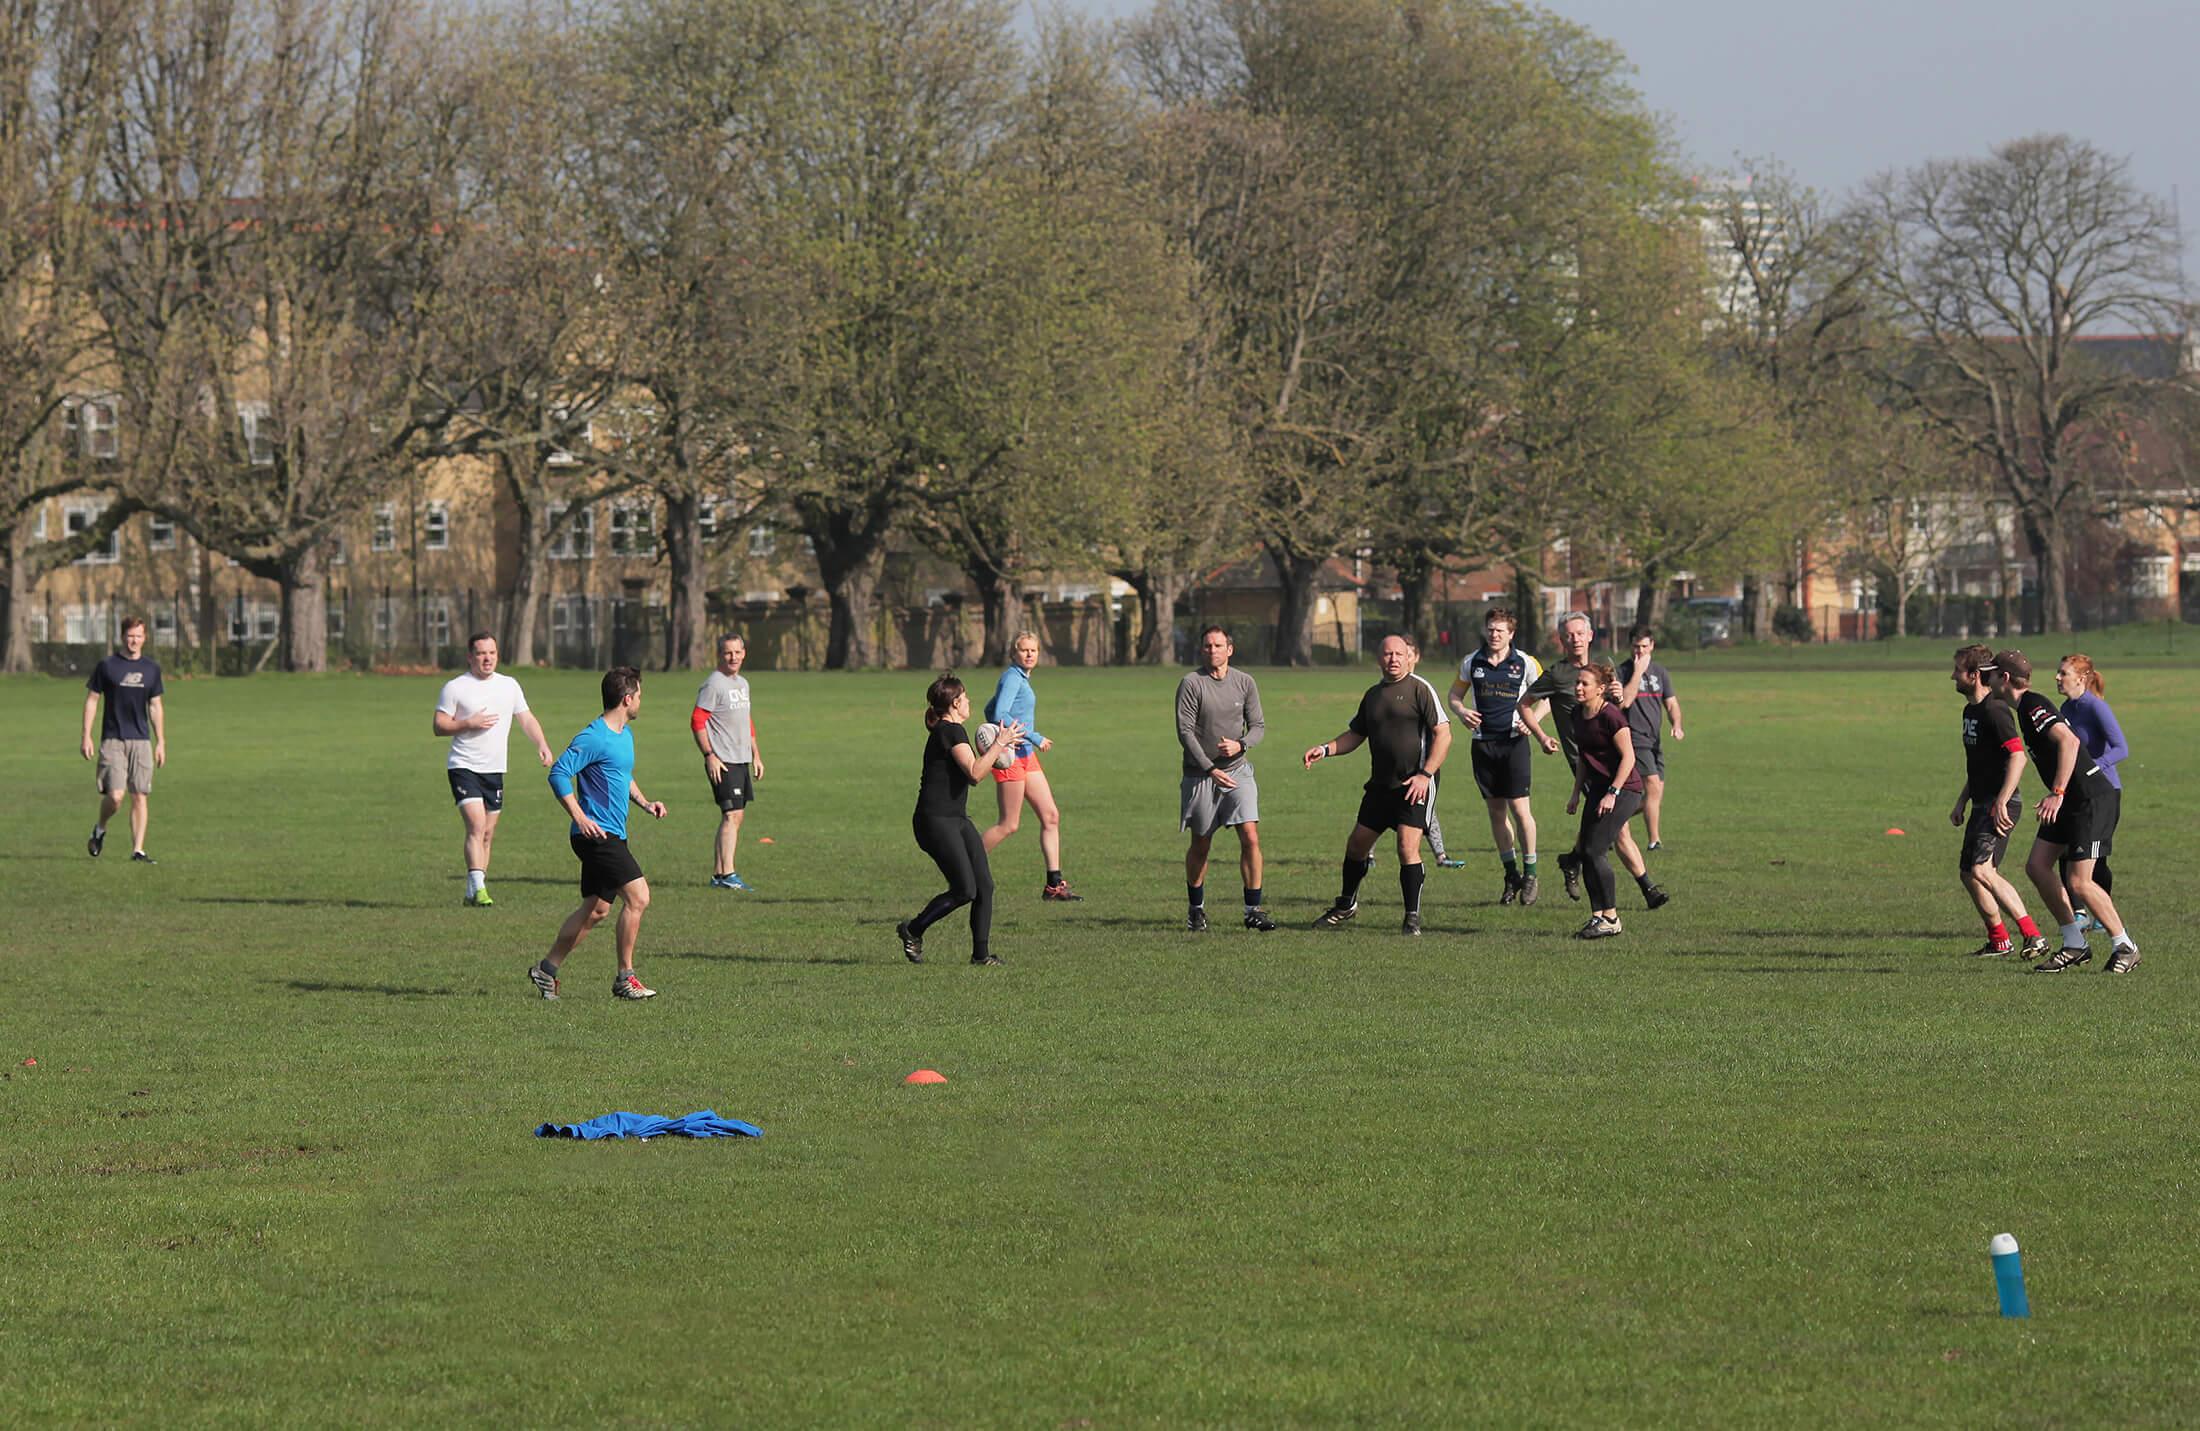 Wandsworth Common Group Activities